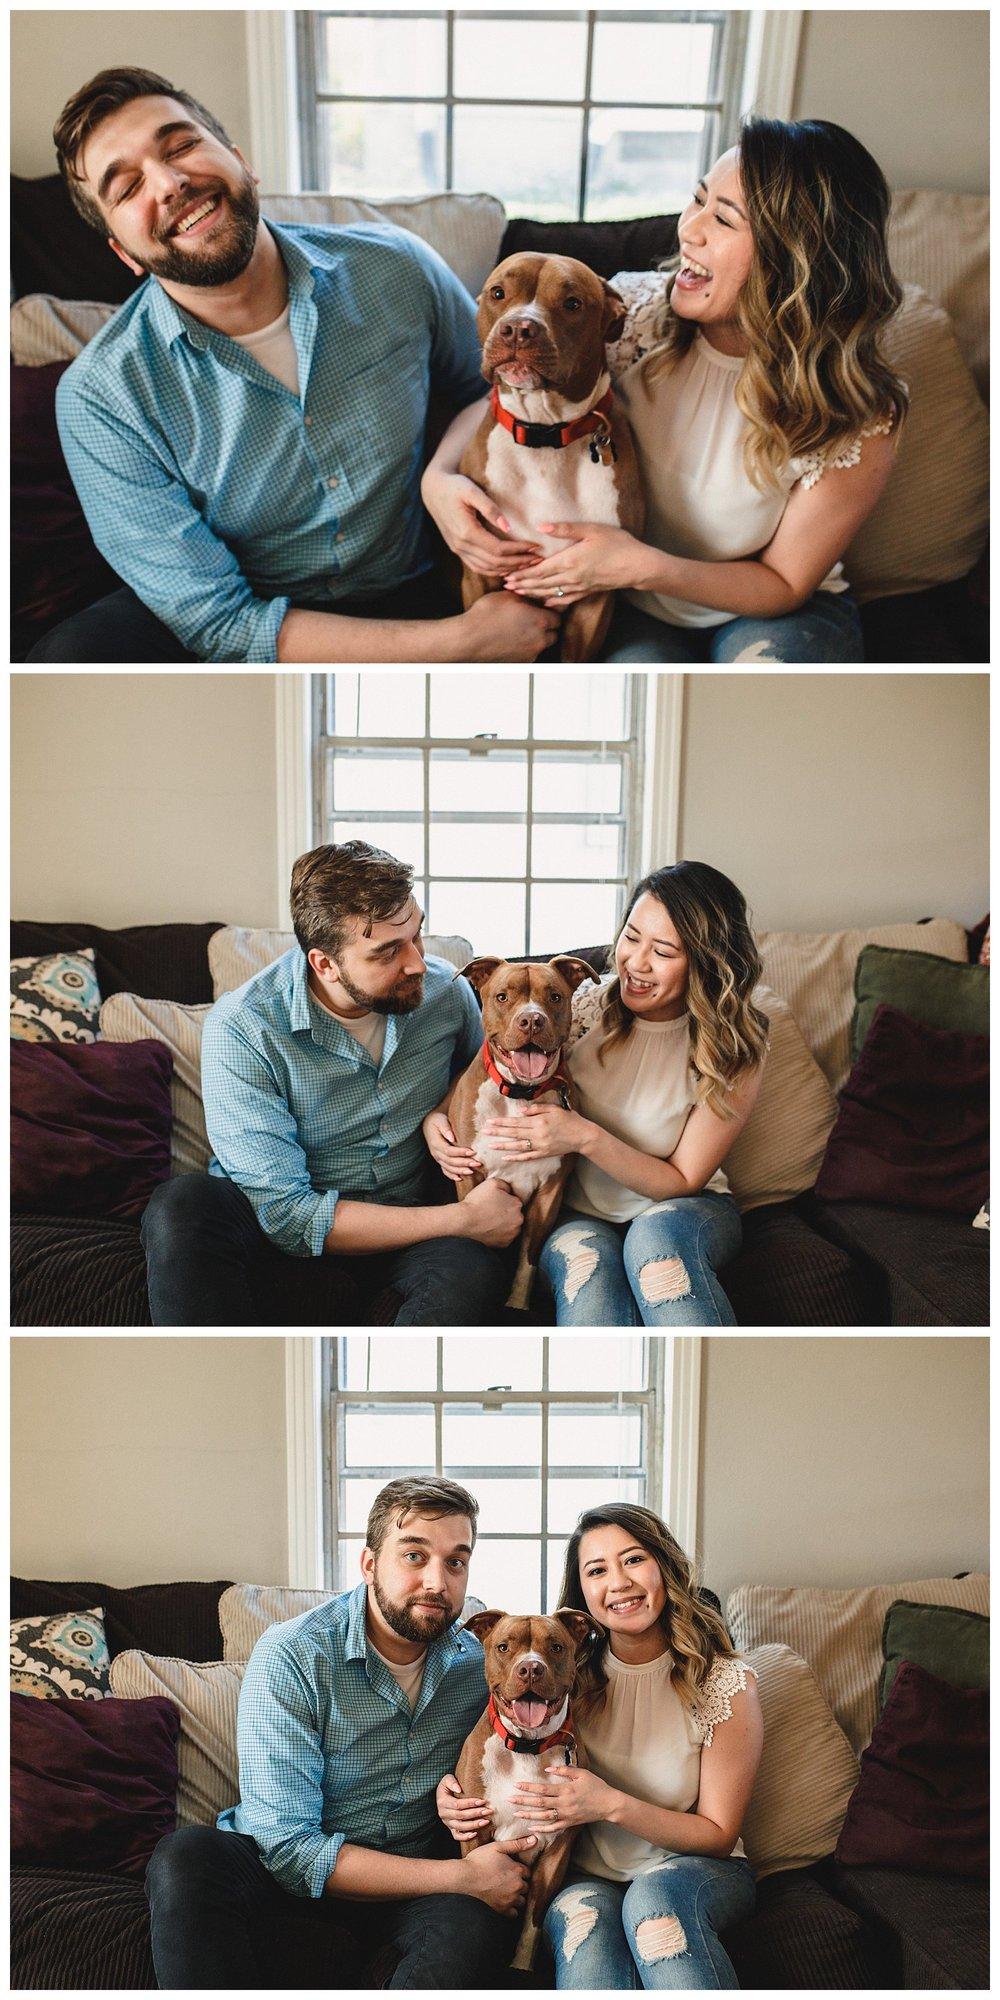 Kelsey_Diane_Photography_Kansas_City_Engagement_Loose_Park_Dog_In_Home_Engagement_Rosa_Joe_Pit_Bull_Loose_Park_0554.jpg